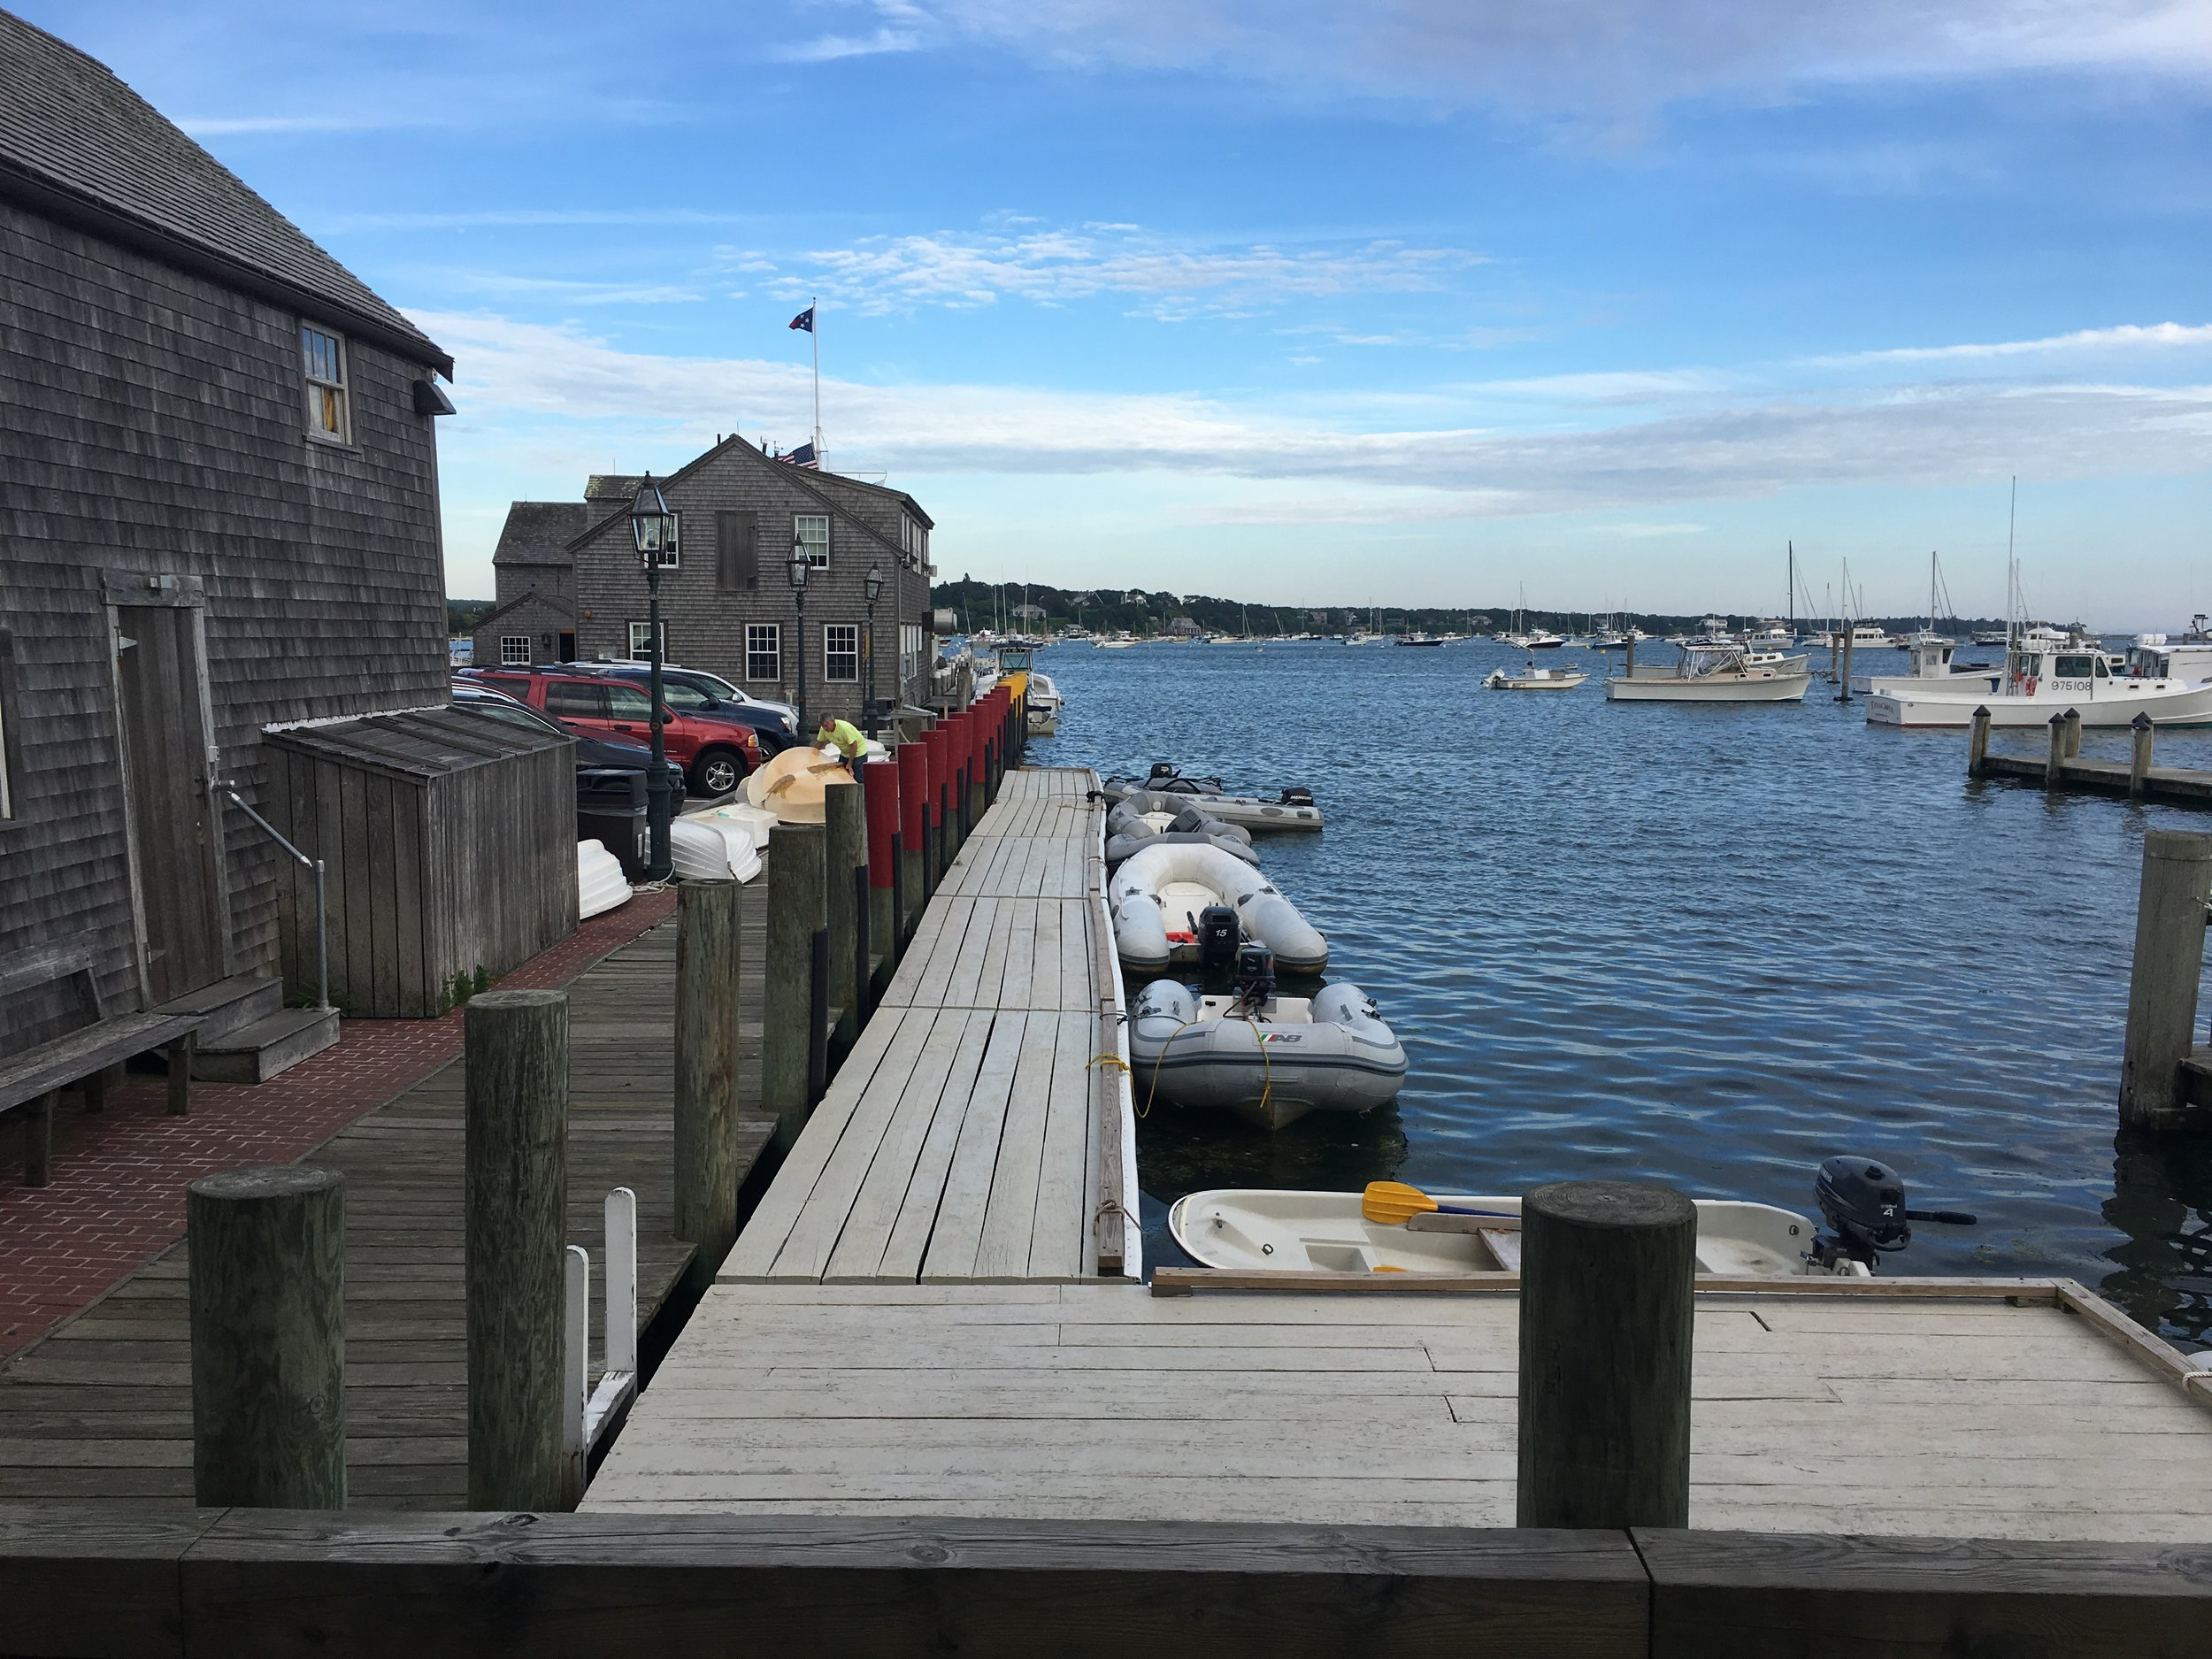 My view as I write this blog. –E